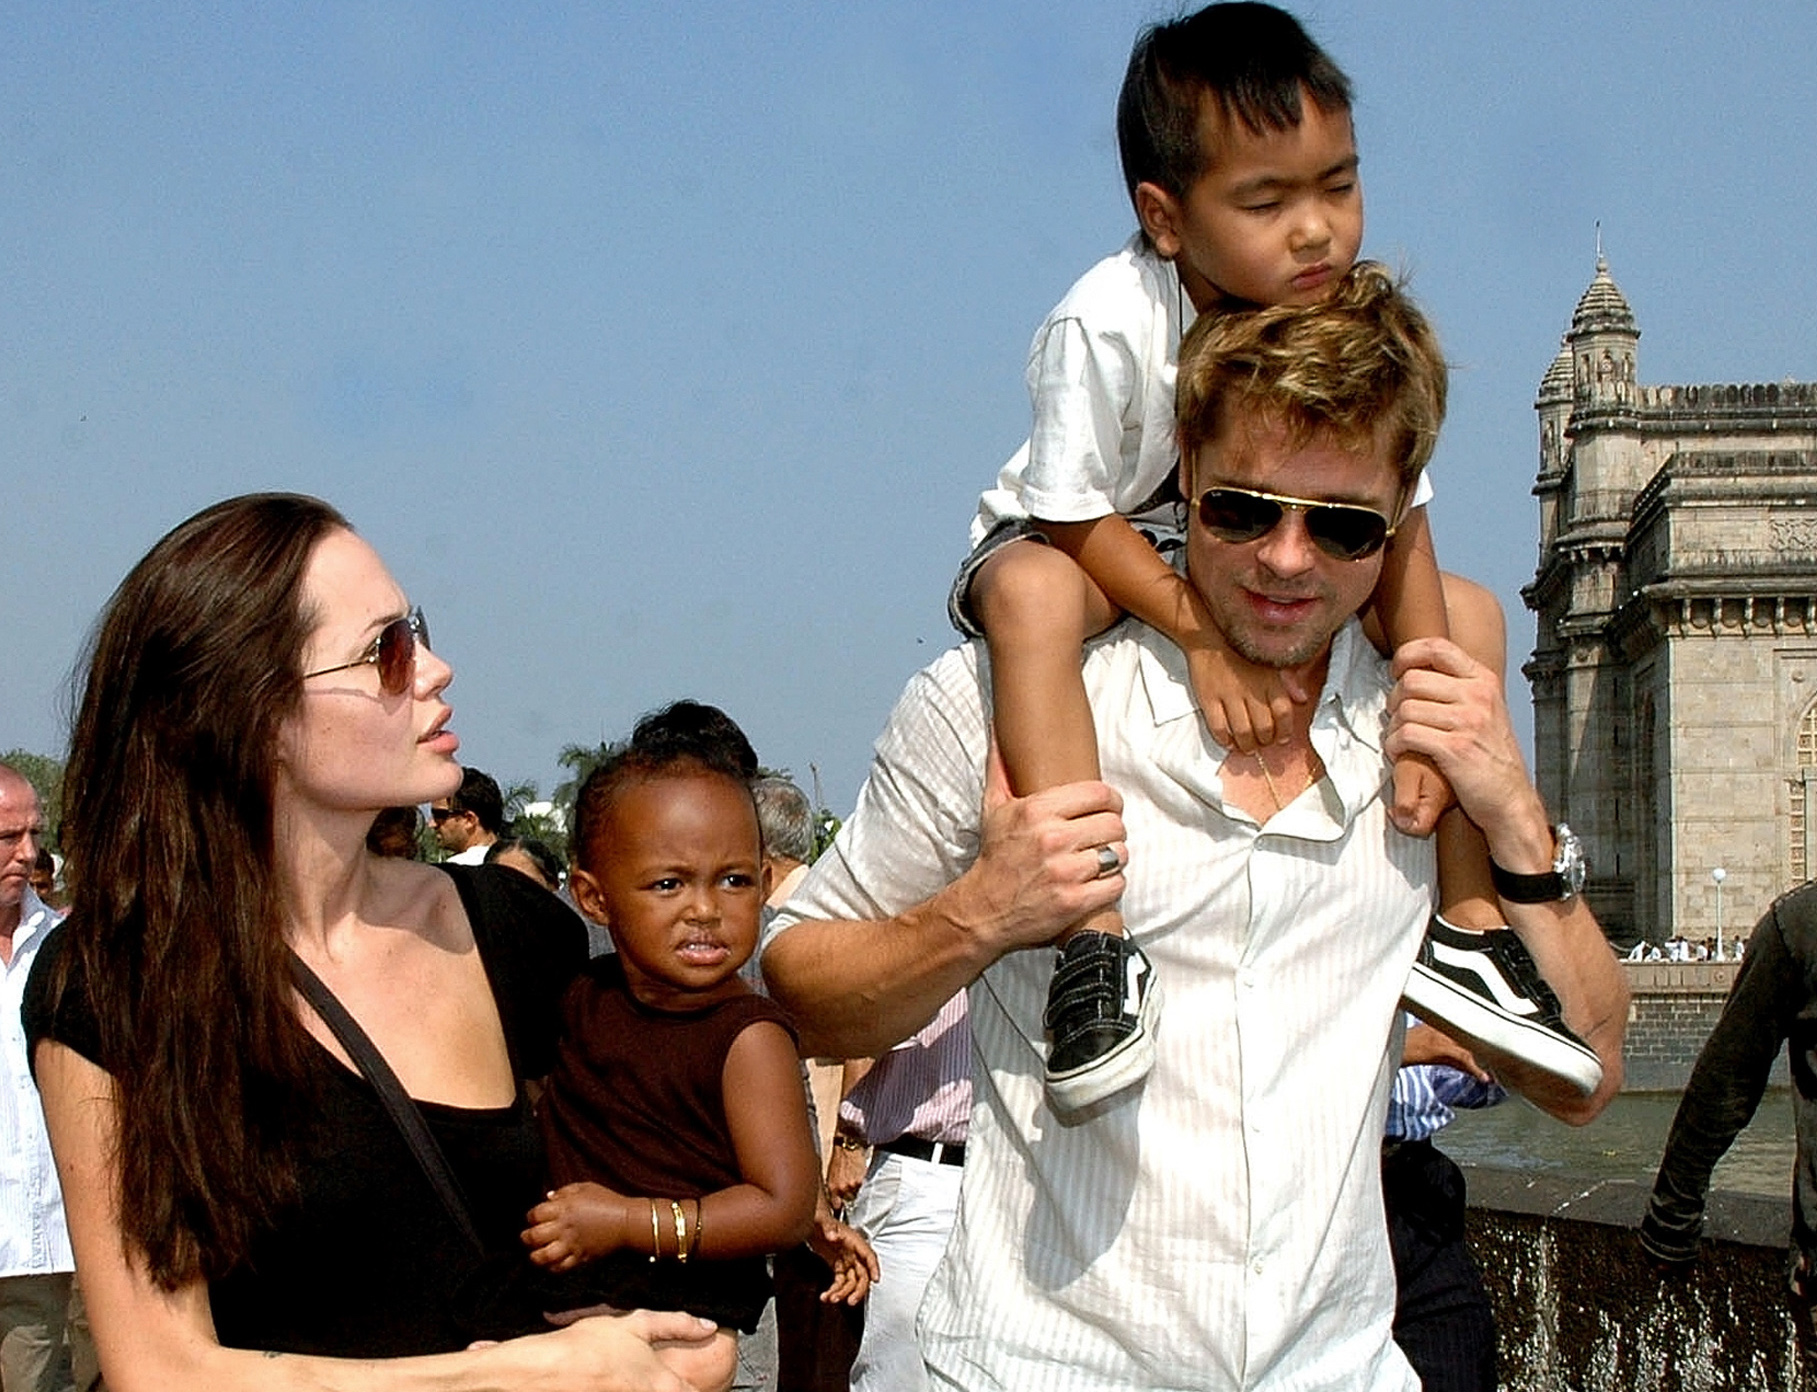 Brad Pitt child abuse, Brad Pitt rumors, Brad Pitt Angelina Jolie divorce, Brad Pitt Angelina Jolie kids, Brad Pitt divorce reason maddox